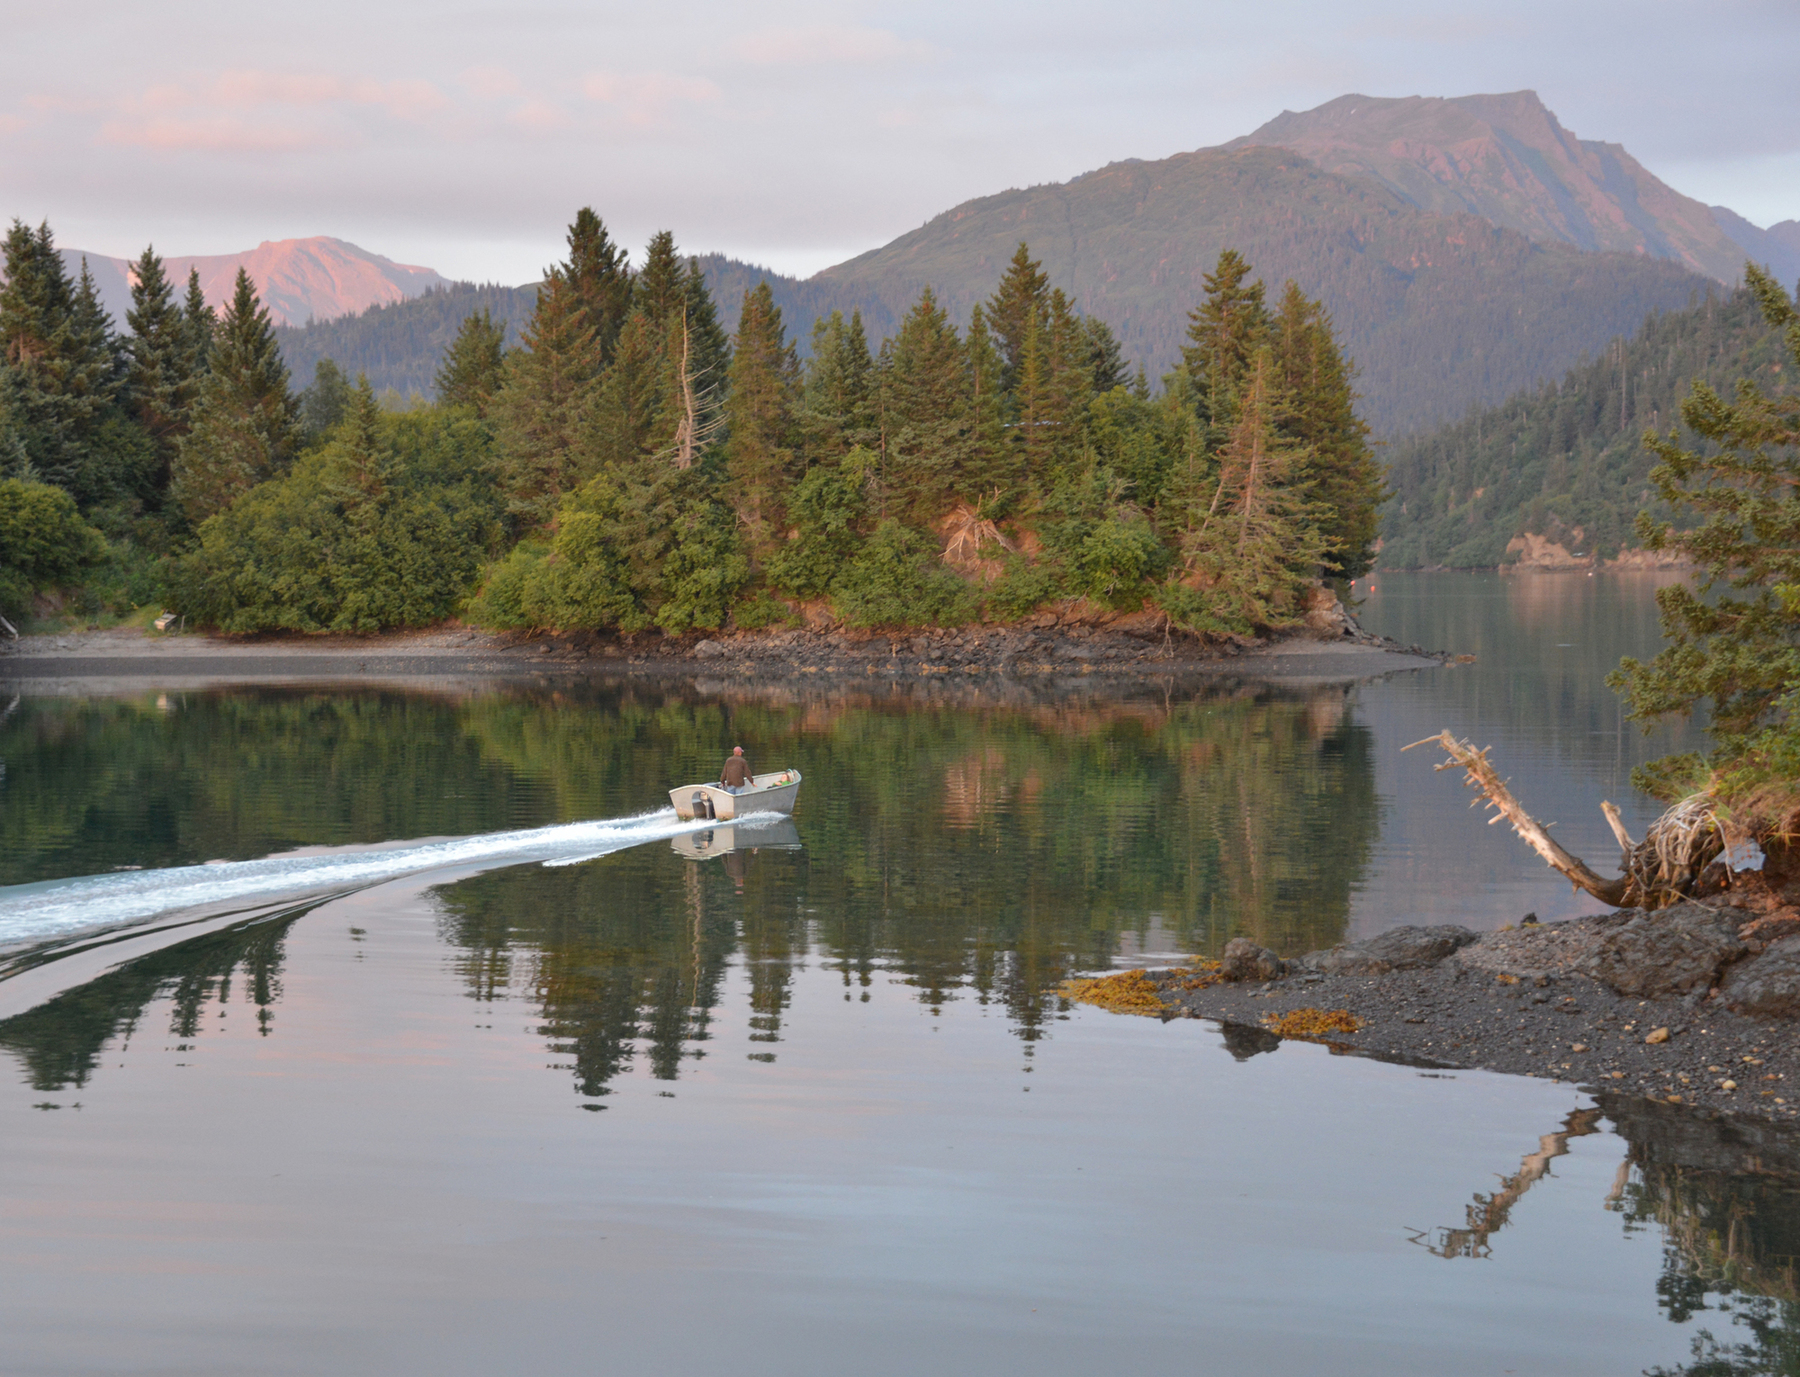 A boat glides across Alaska's Kachemak Bay